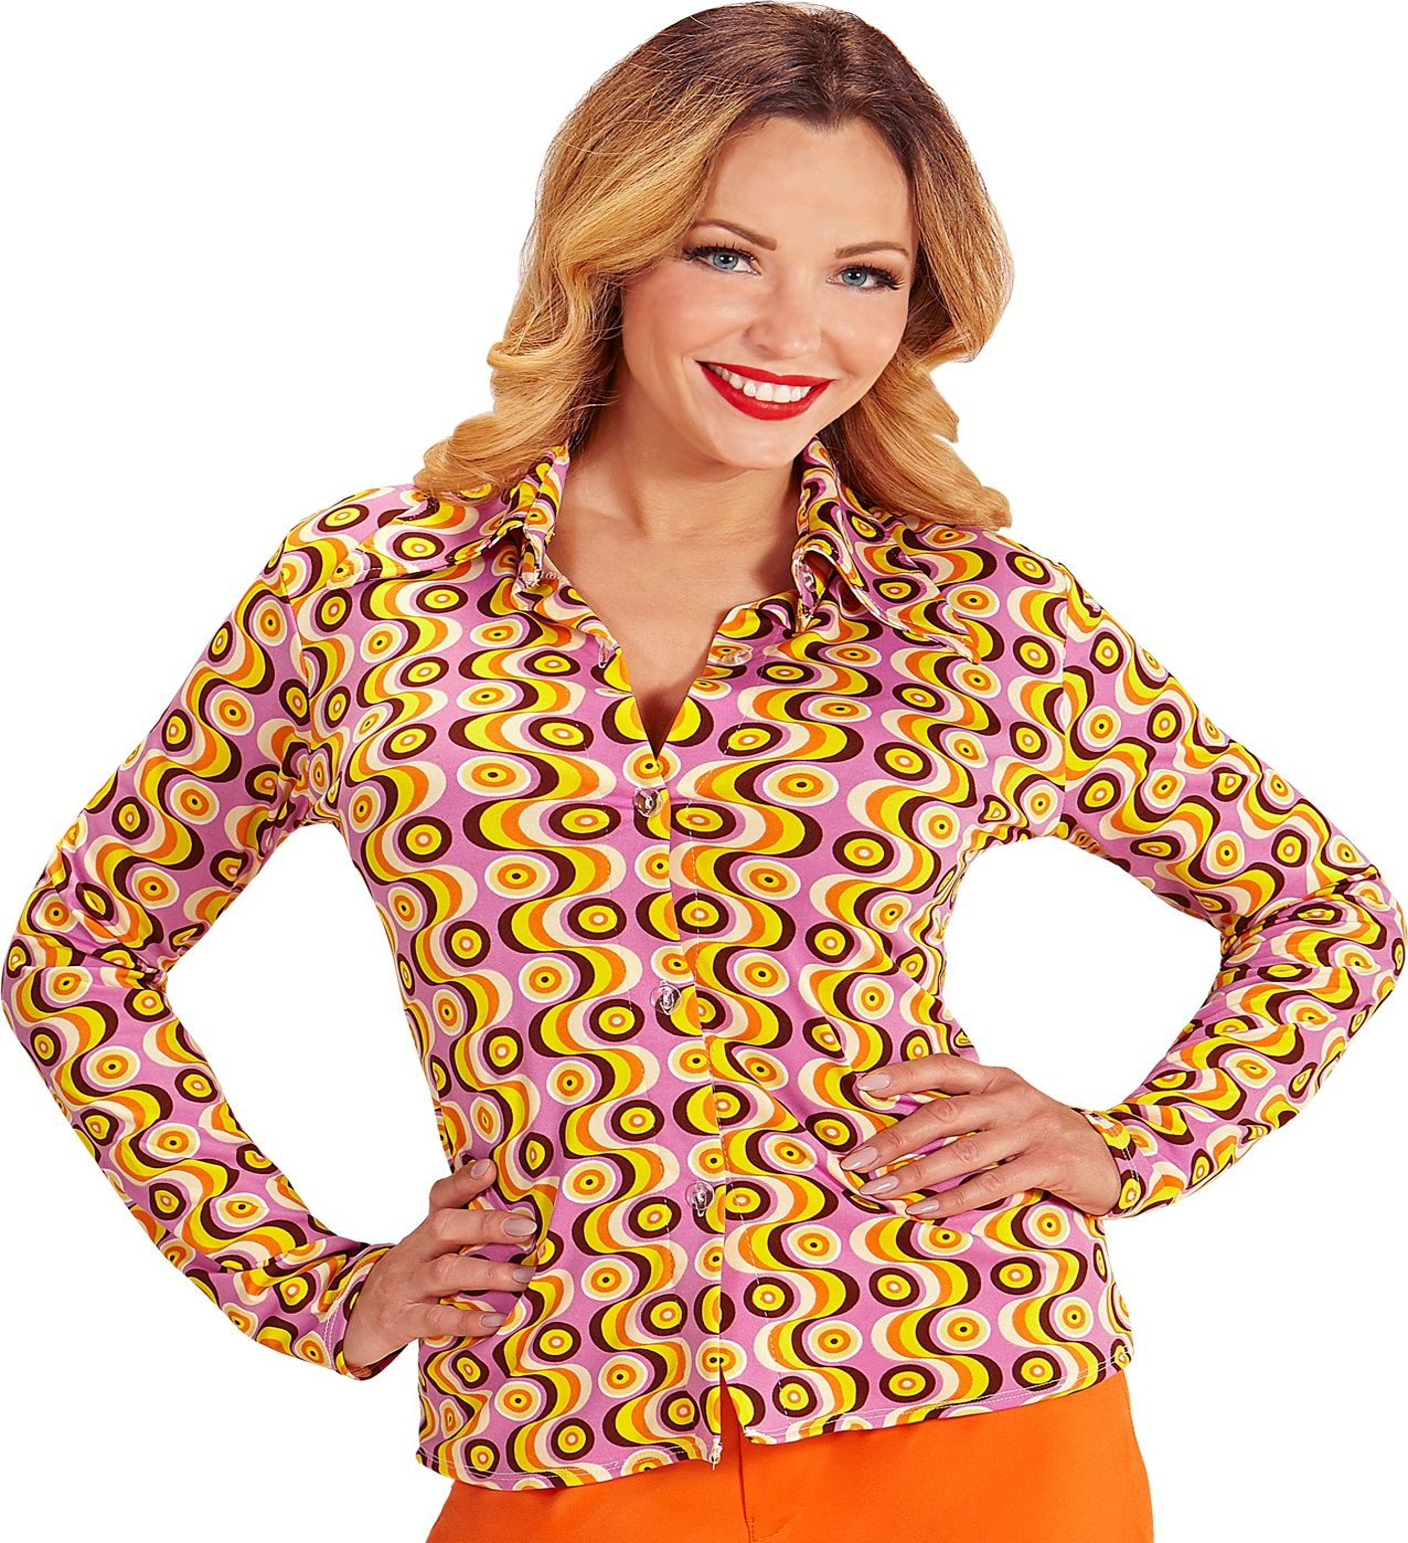 70s groovy dames shirt